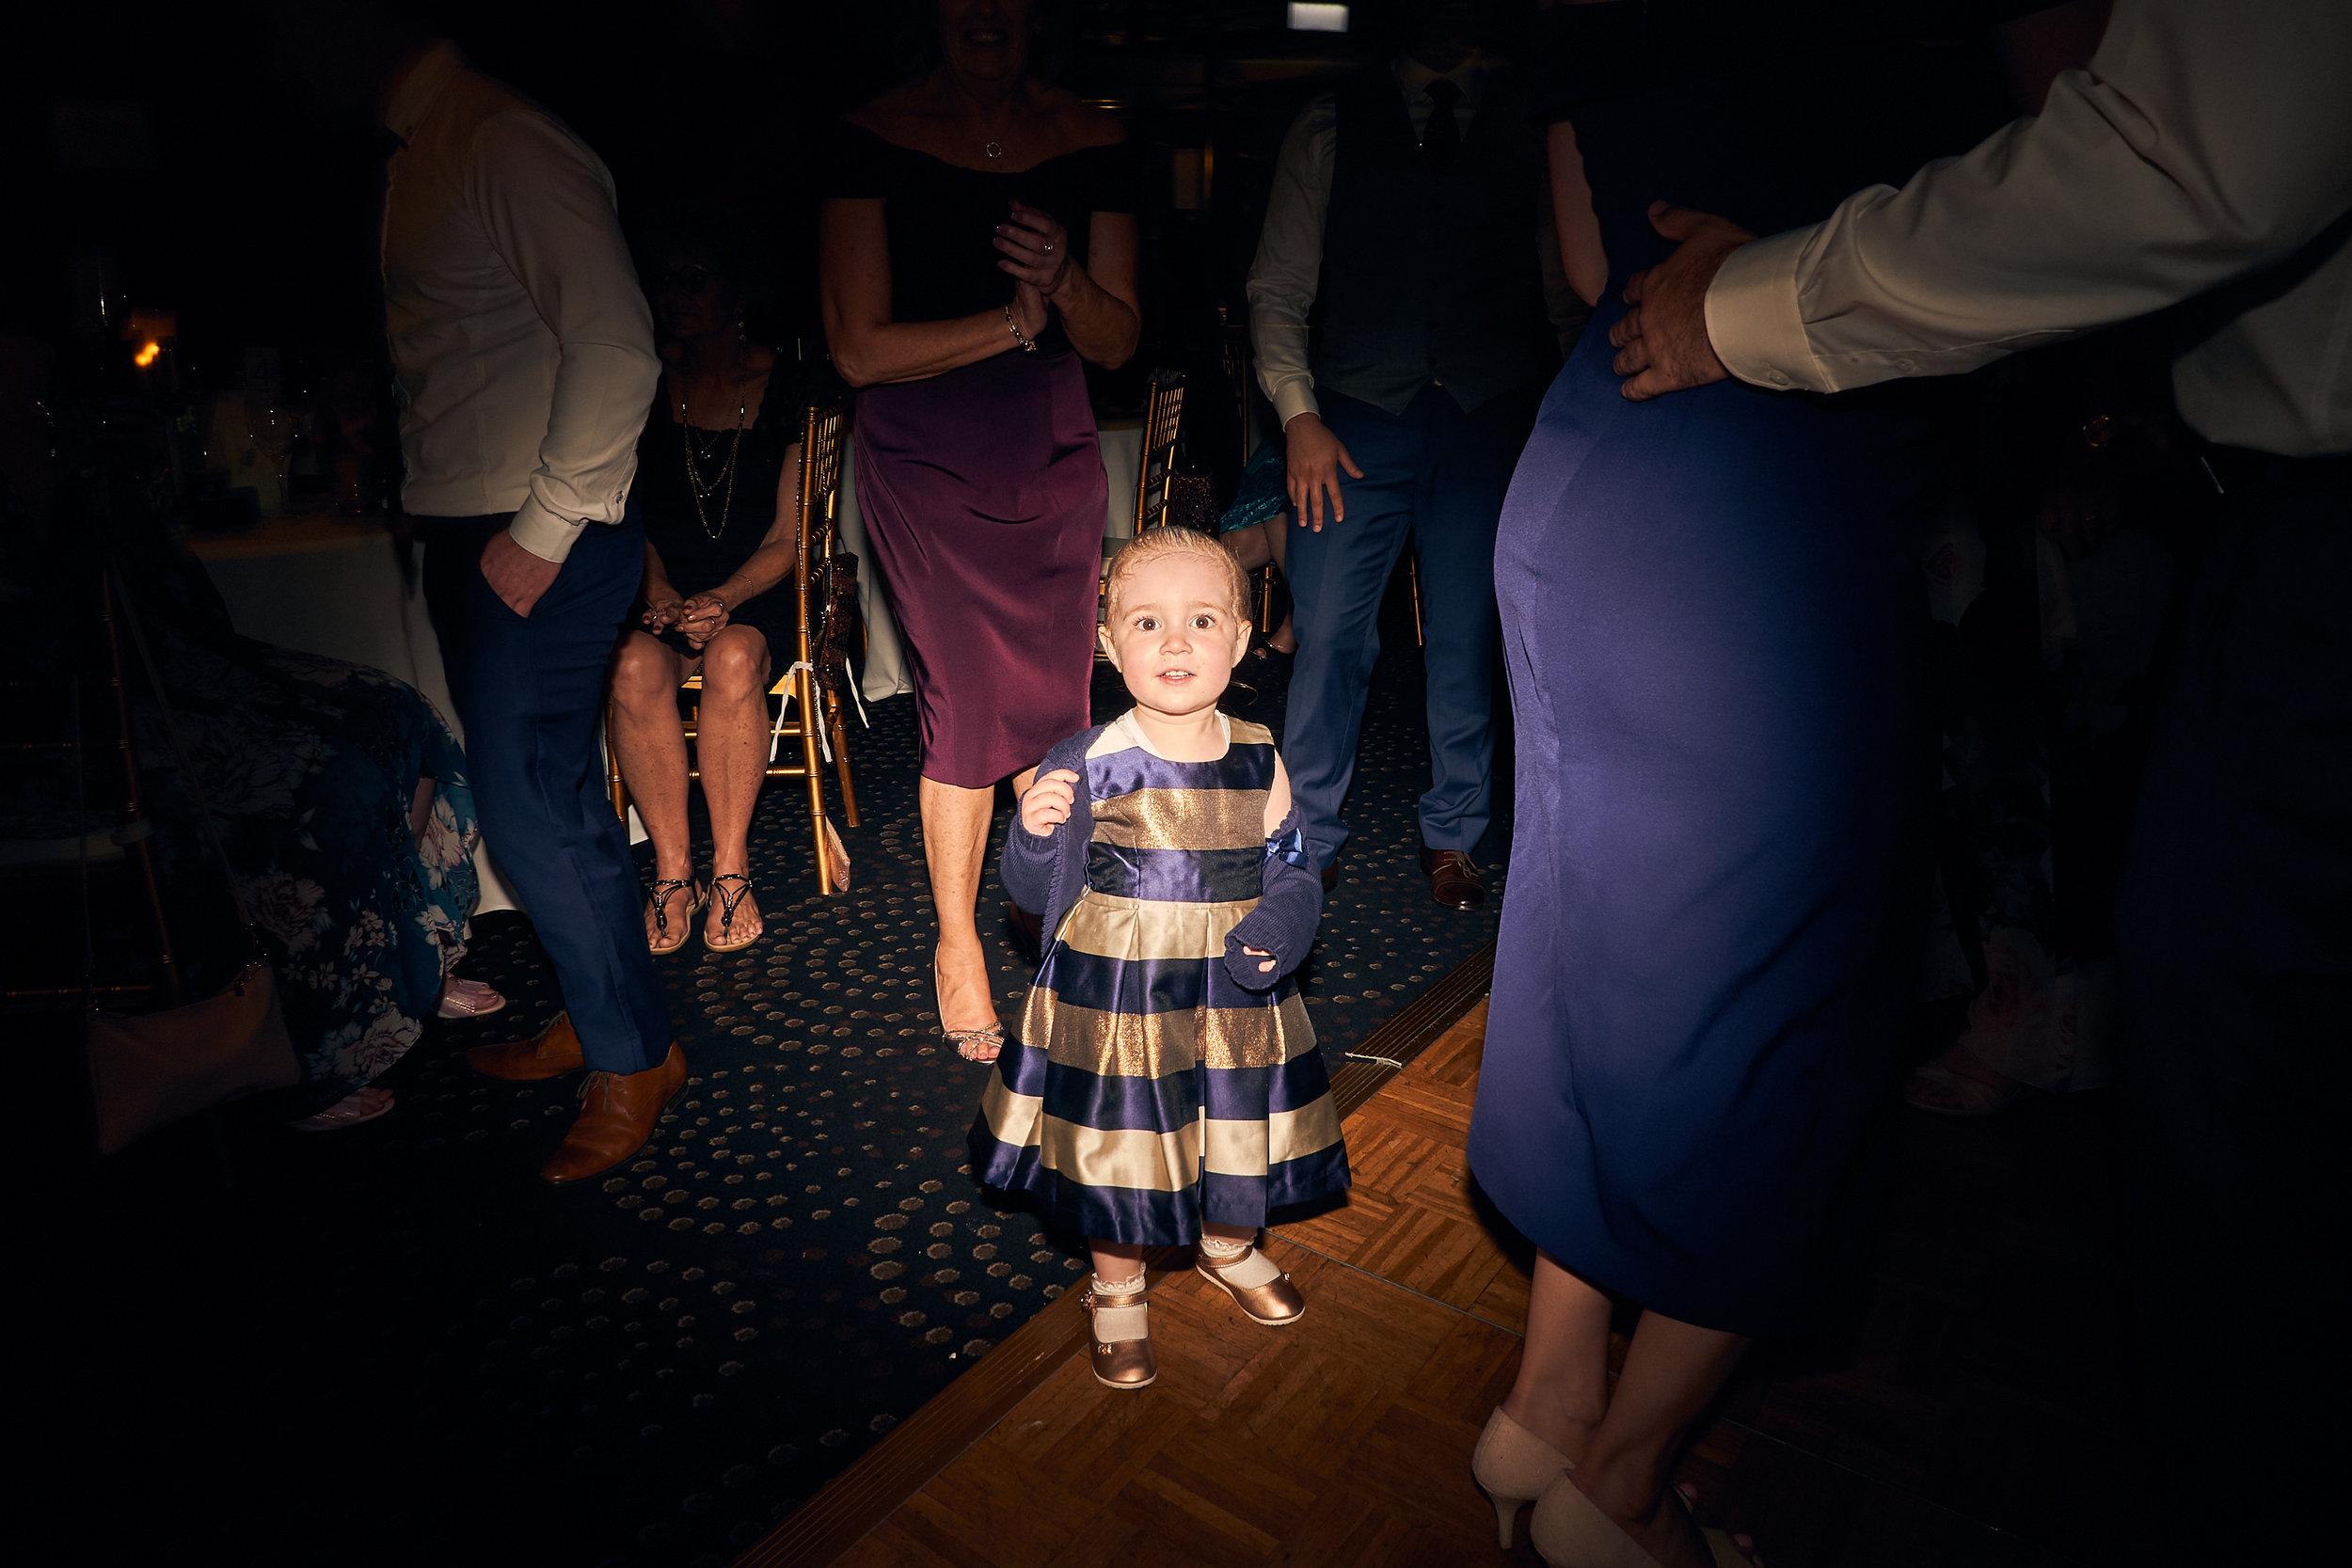 2018-10-20-jay-la-photography-kirsty-andres-643.JPG